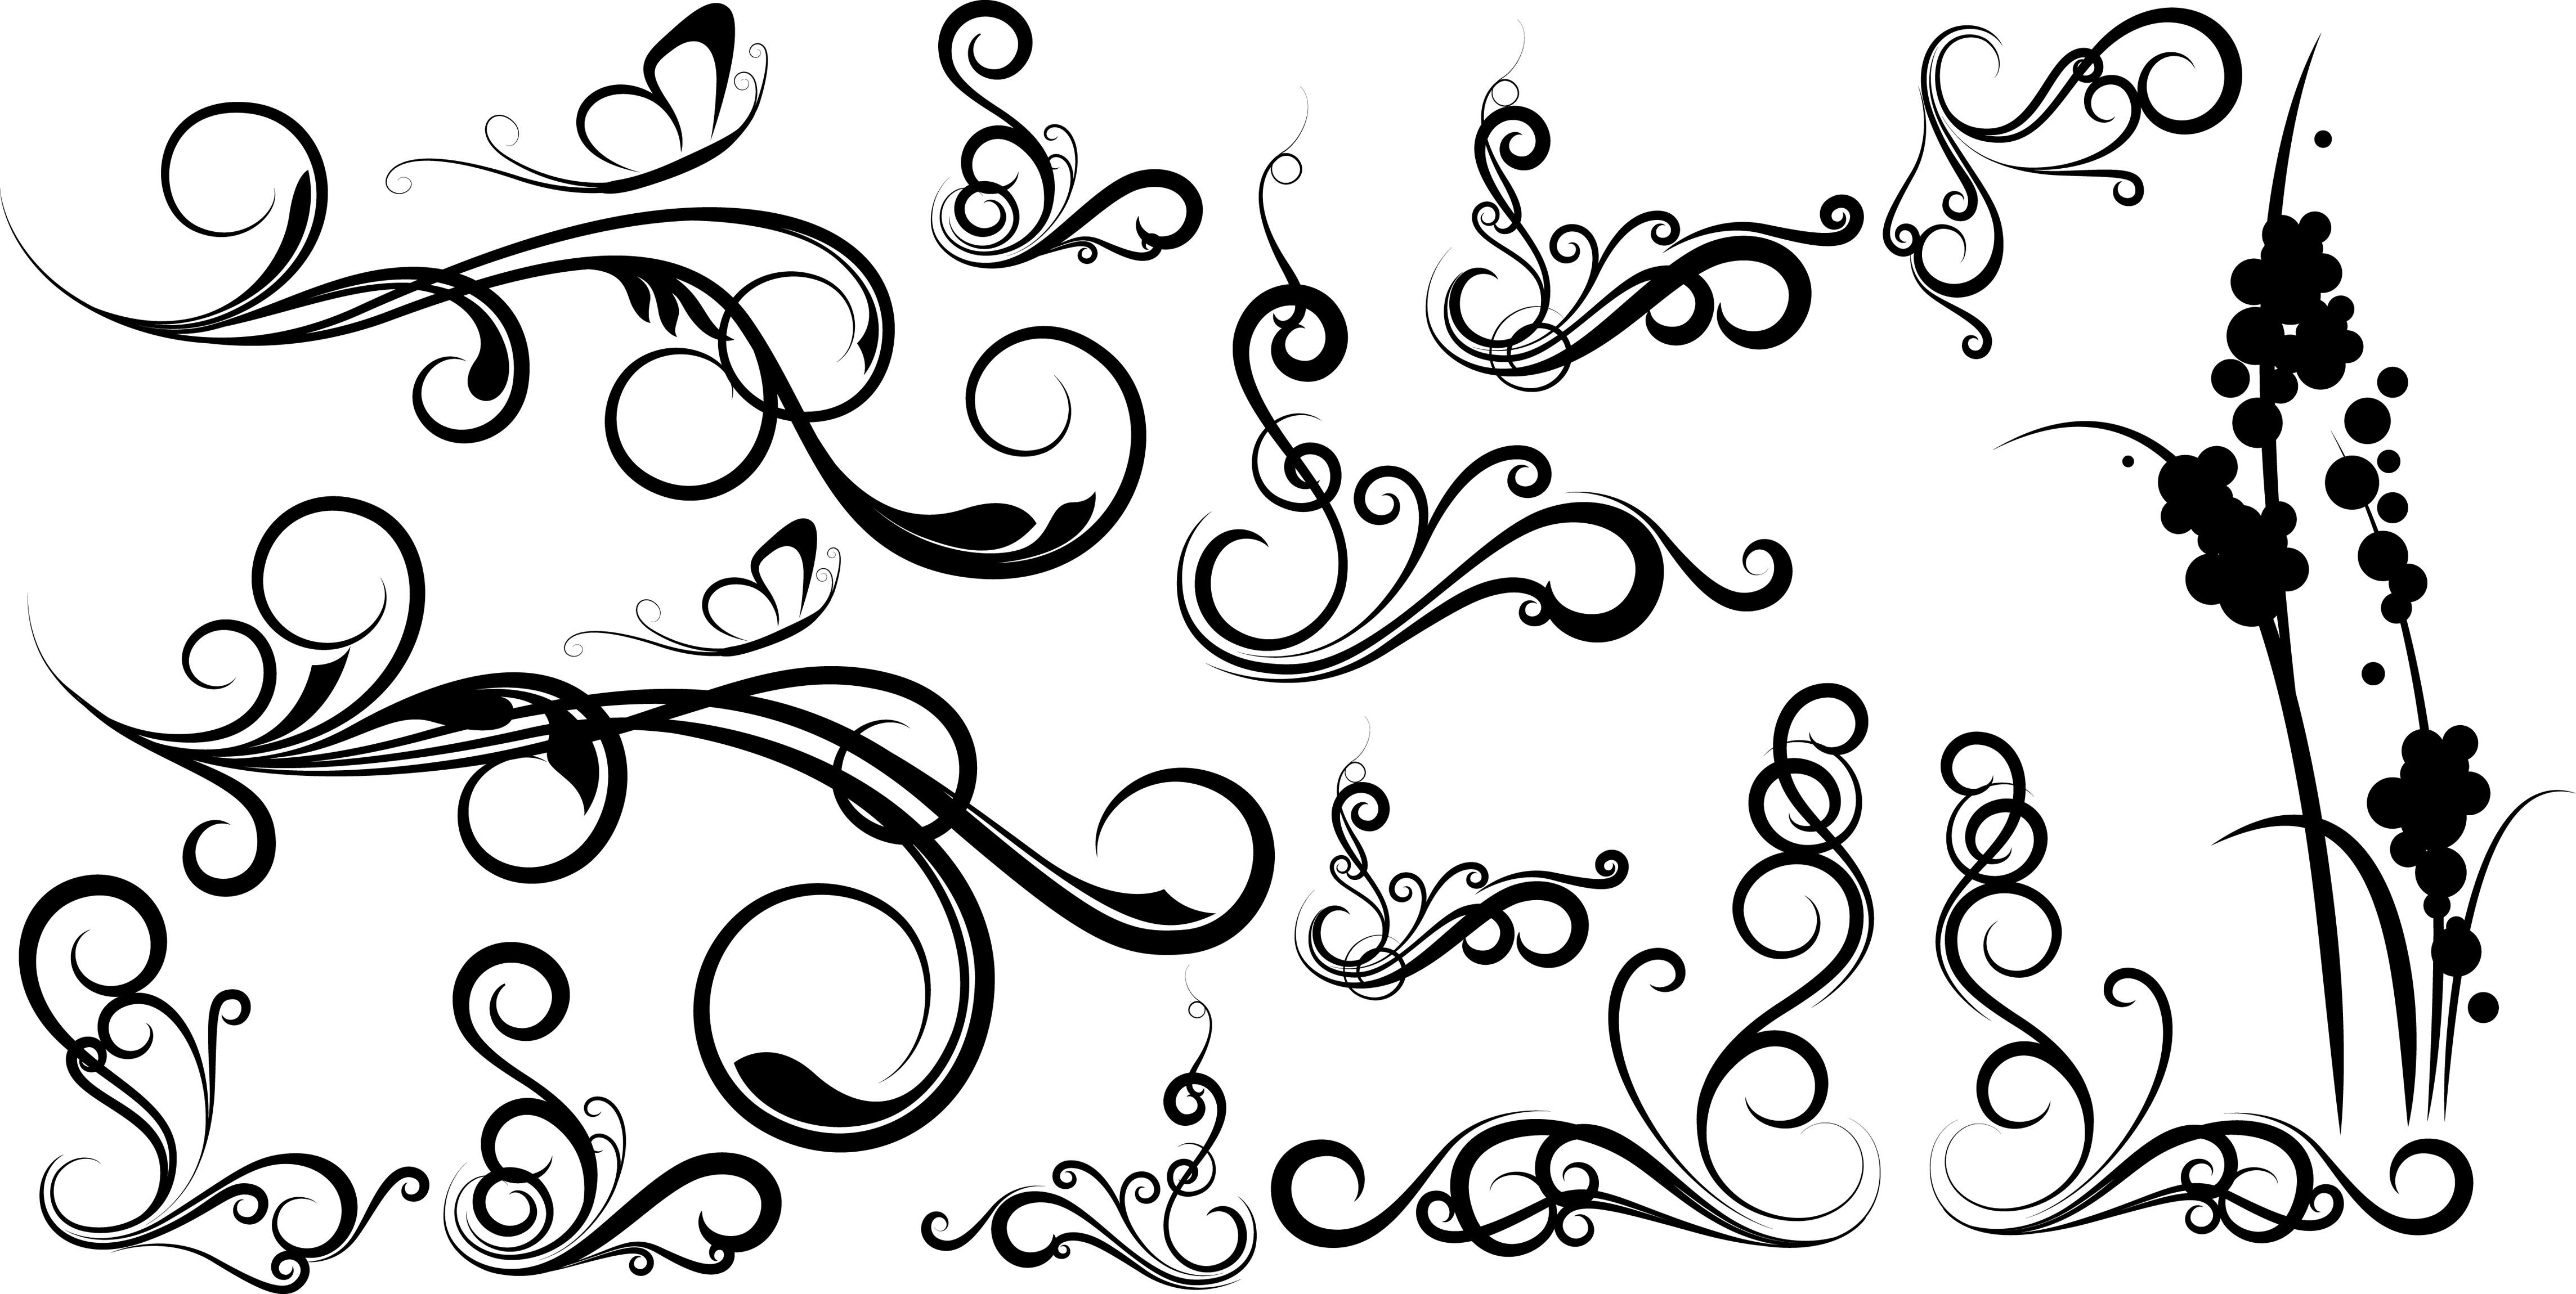 Elegant Swirl Designs Vector